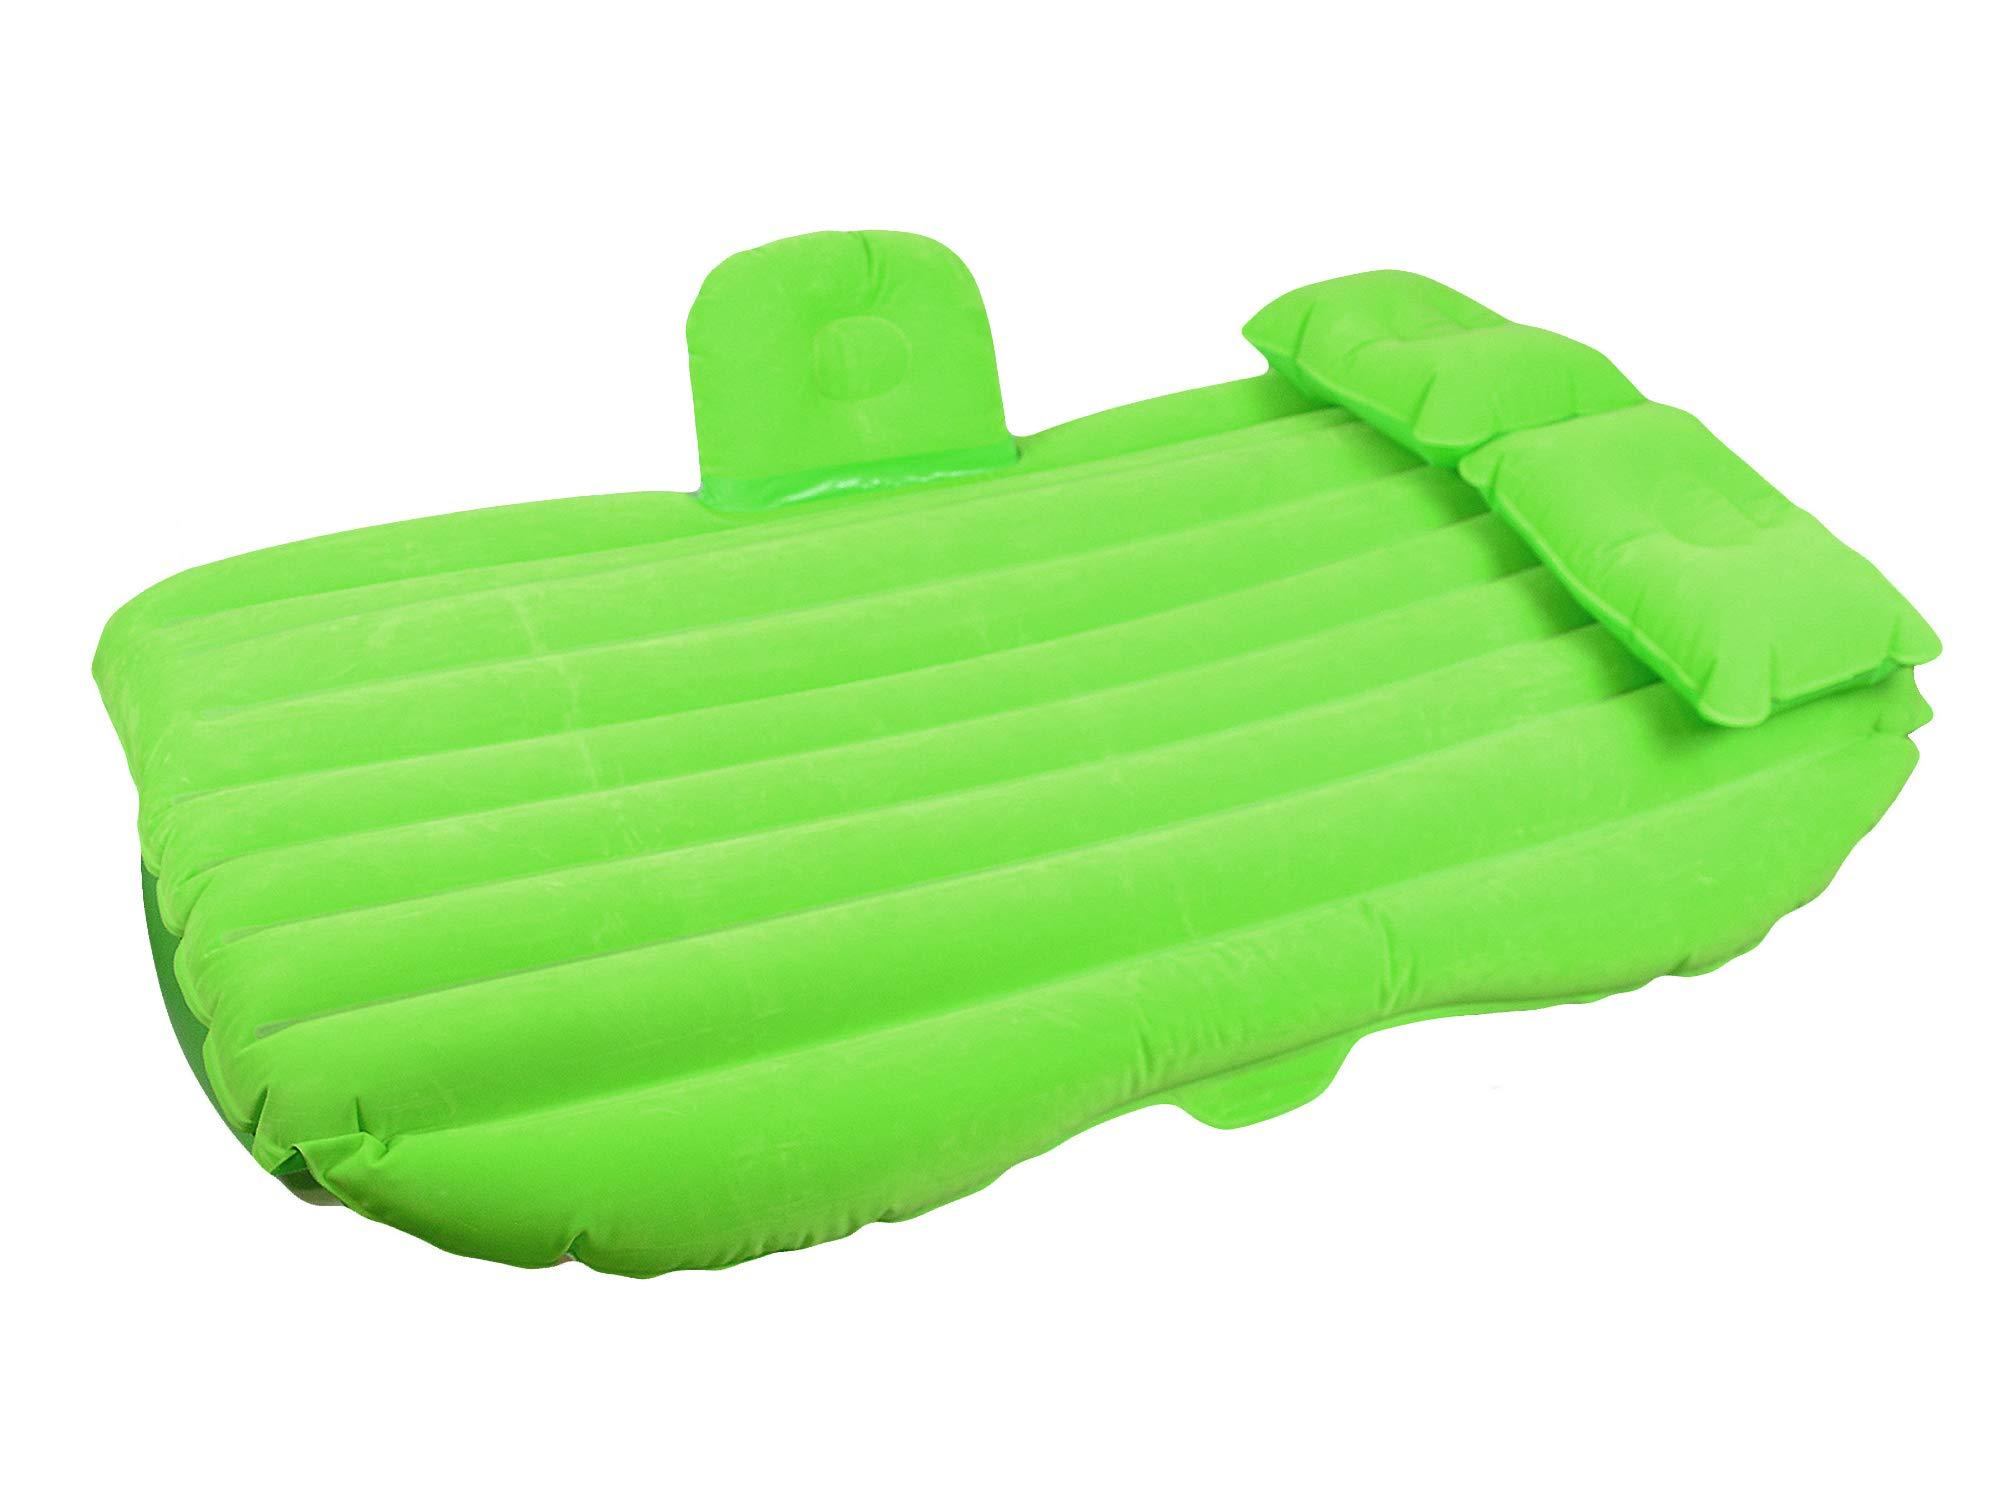 EGI Universal Heavy Duty SUV, Sedan, Truck Back Seat Extended Air Bed - Inflatable Travel Mattress (Green) by EGI